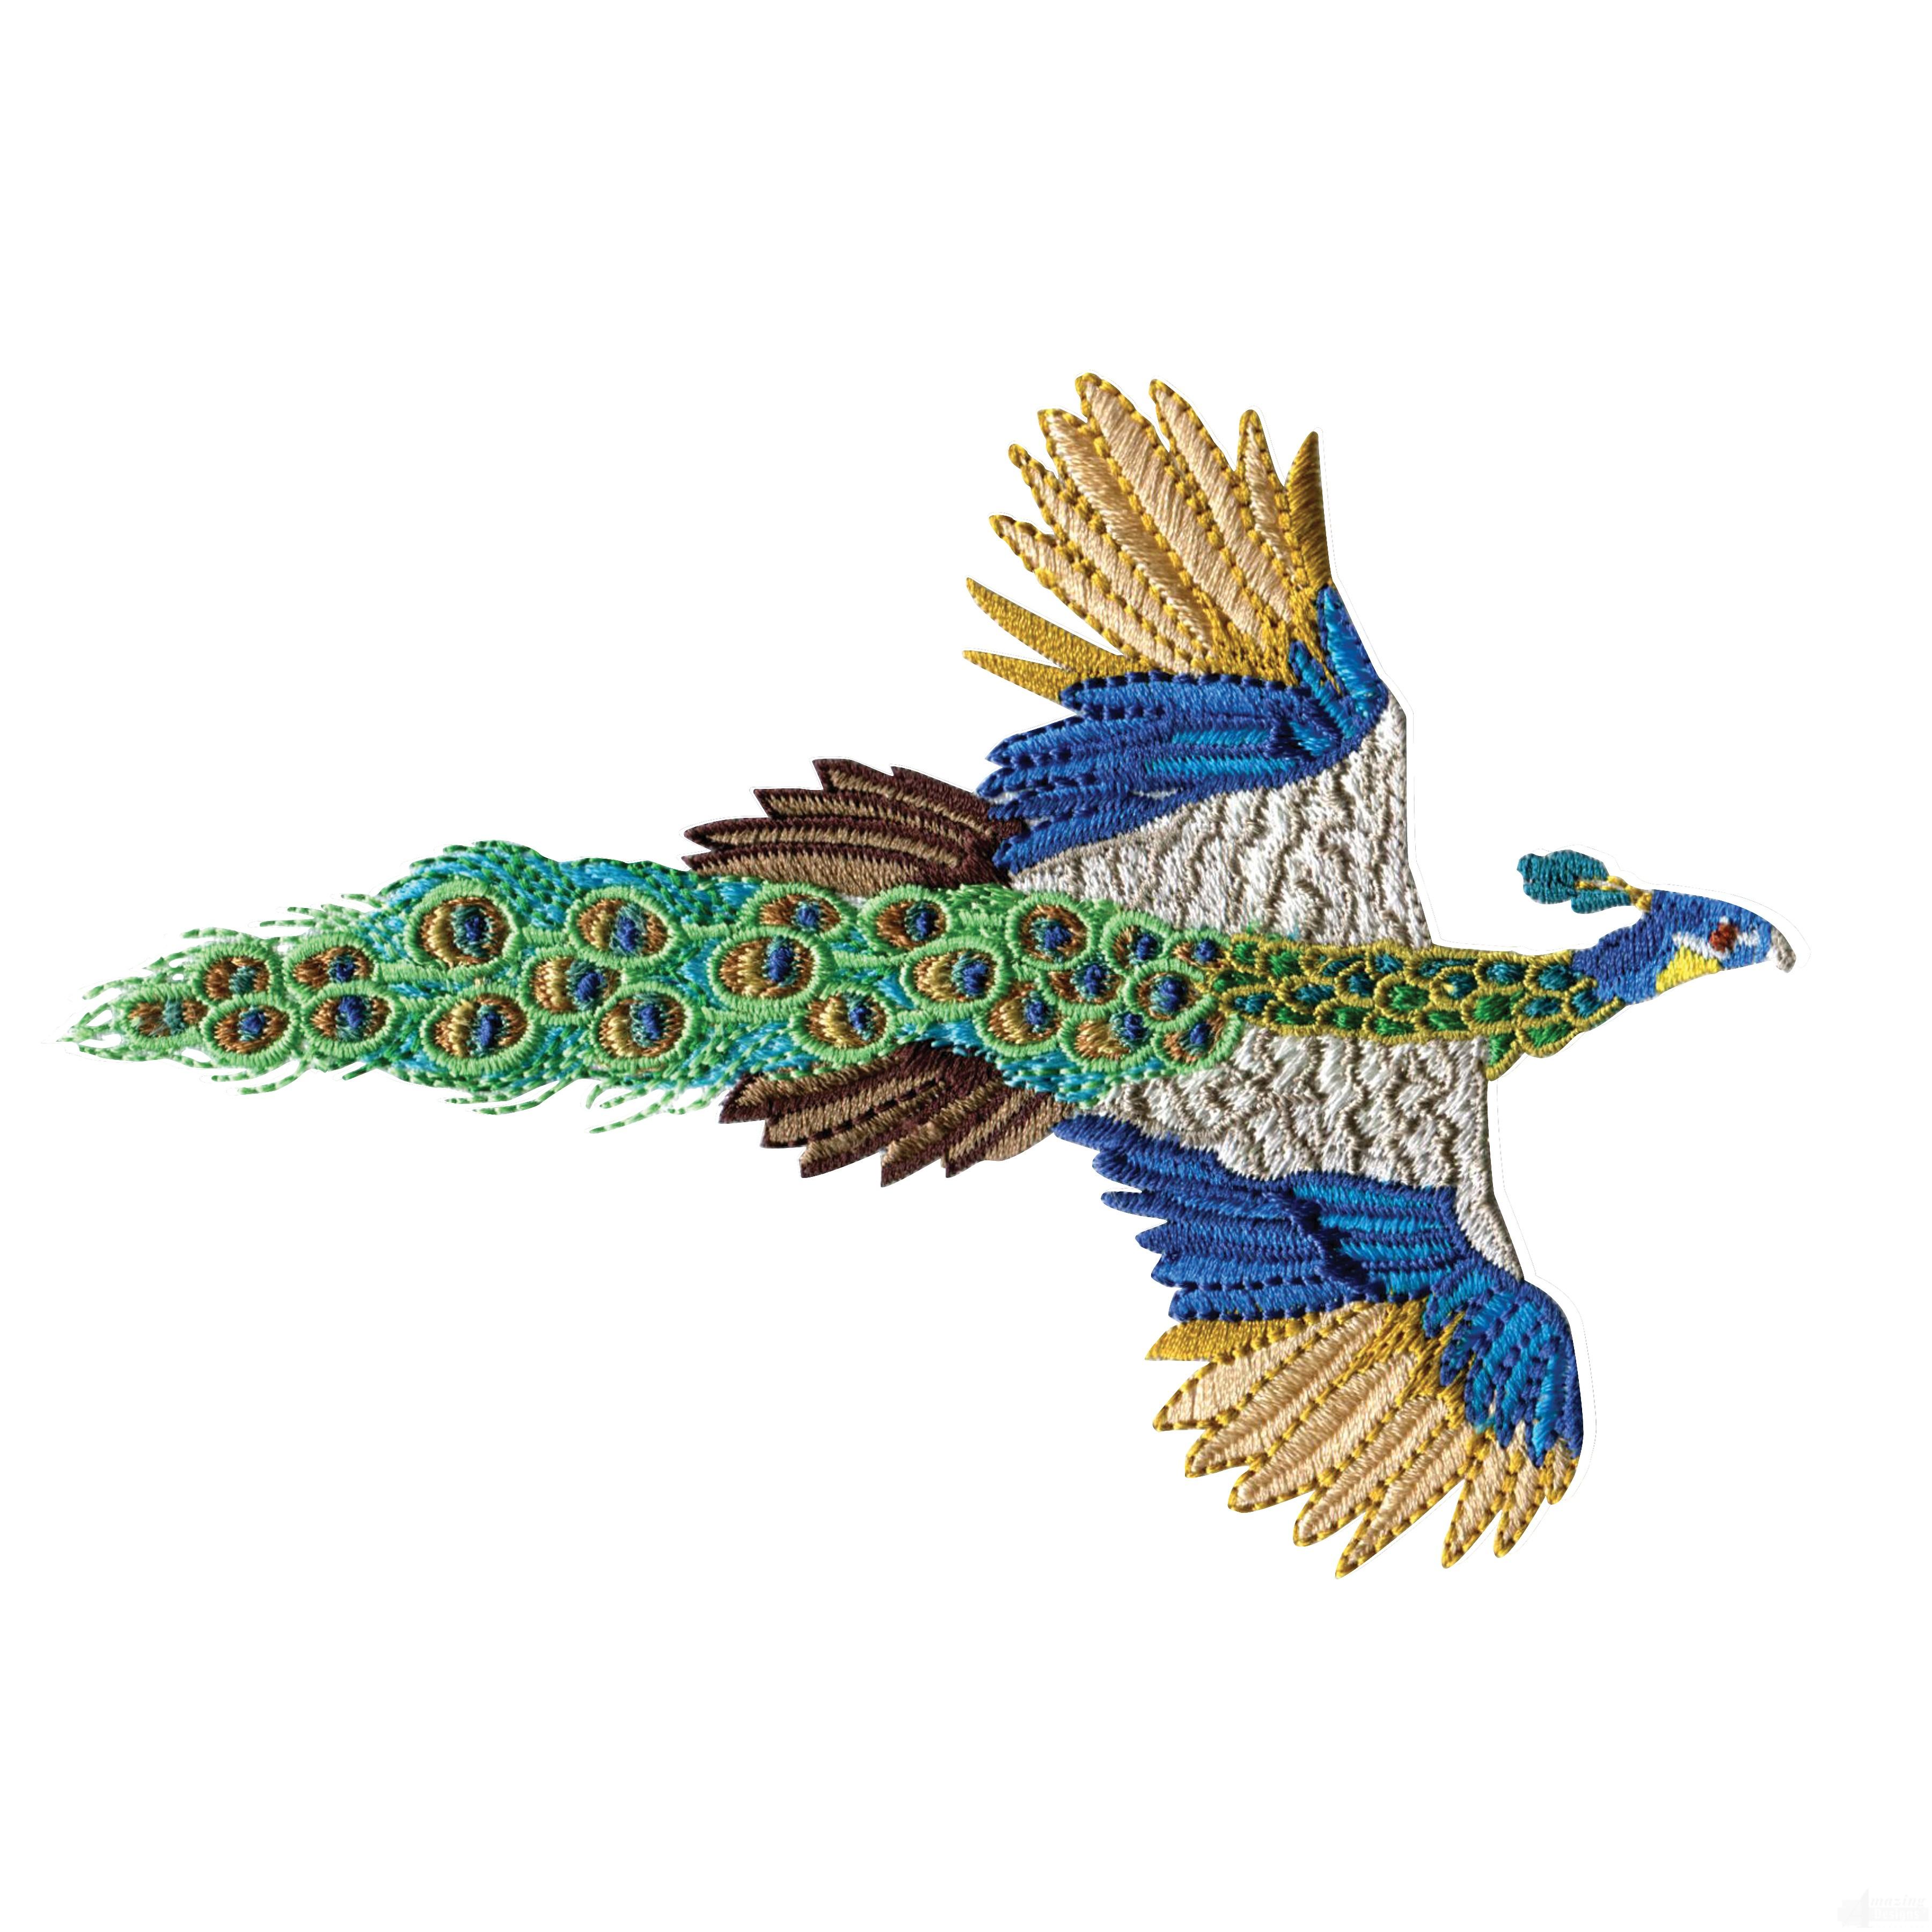 Swnpa143 Peacock Embroidery Design